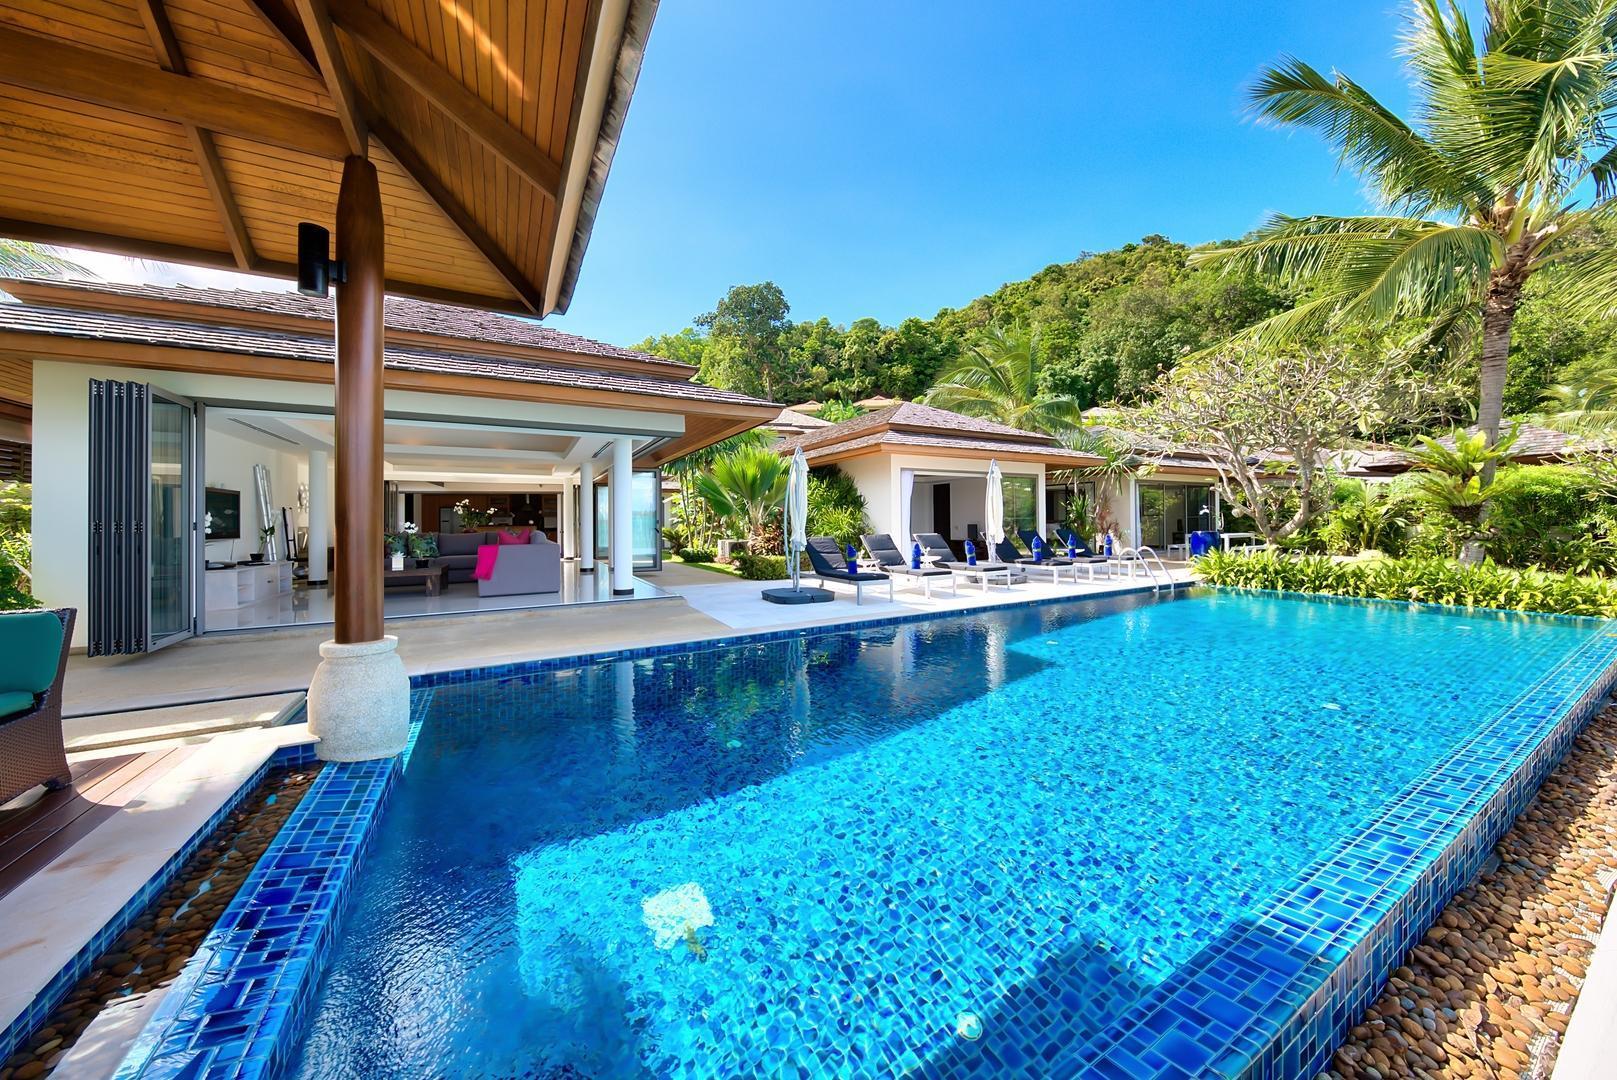 Baan Kularb Dhevatara Residence Villa 2 -4 Bedroom, Beachfront